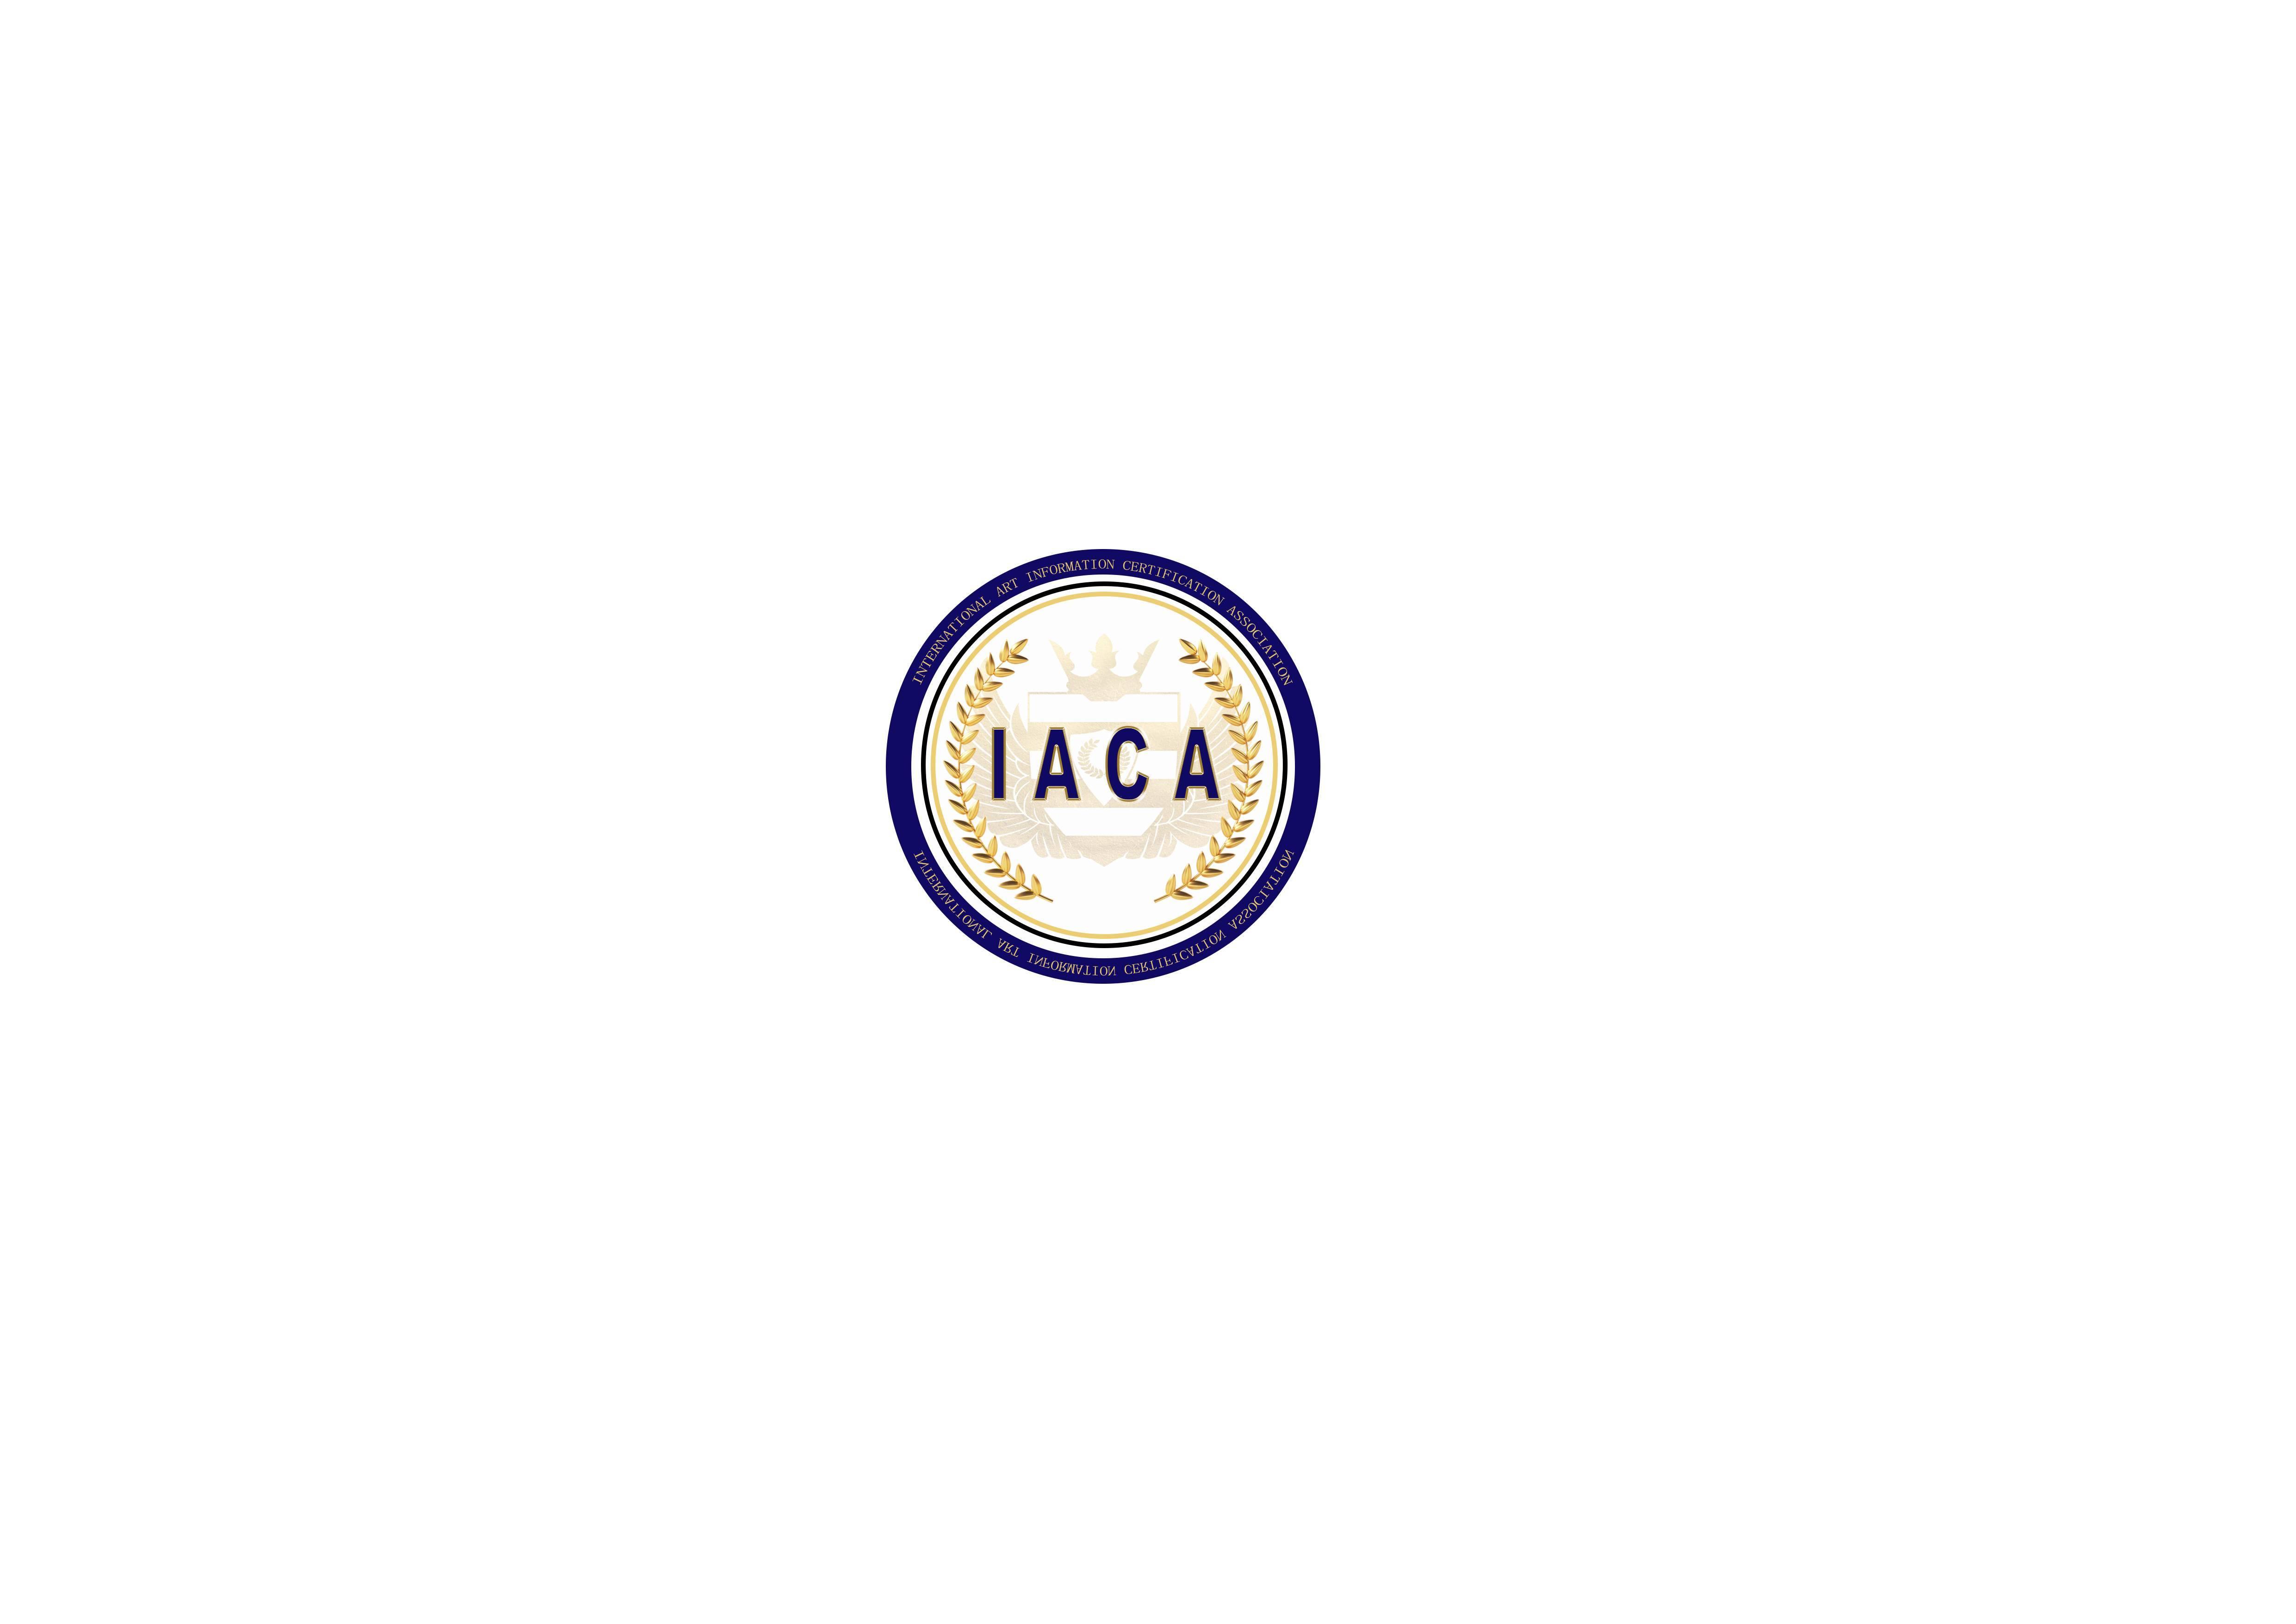 IACA | 您的孩子为什么要参加考级?